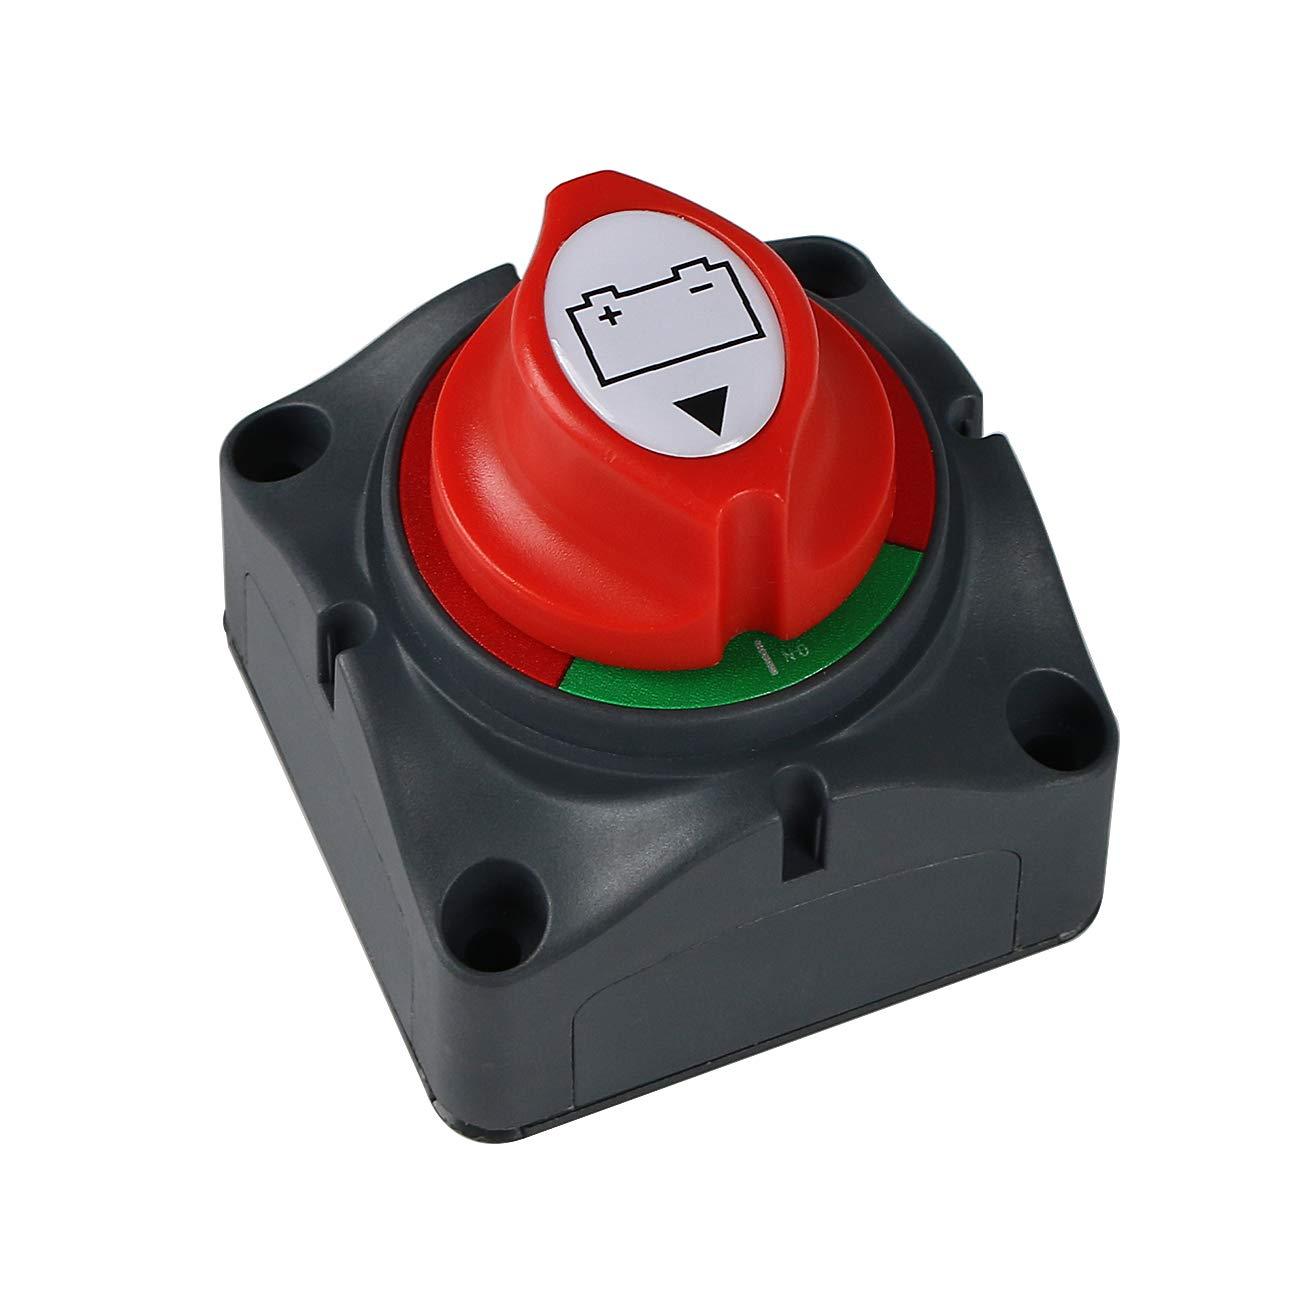 Battery Power On Off Switch Battery Isolator Switch Master Cutoff Switch for Marine Boat Car RV ATV UTV Vehicle 300//10000 Amps